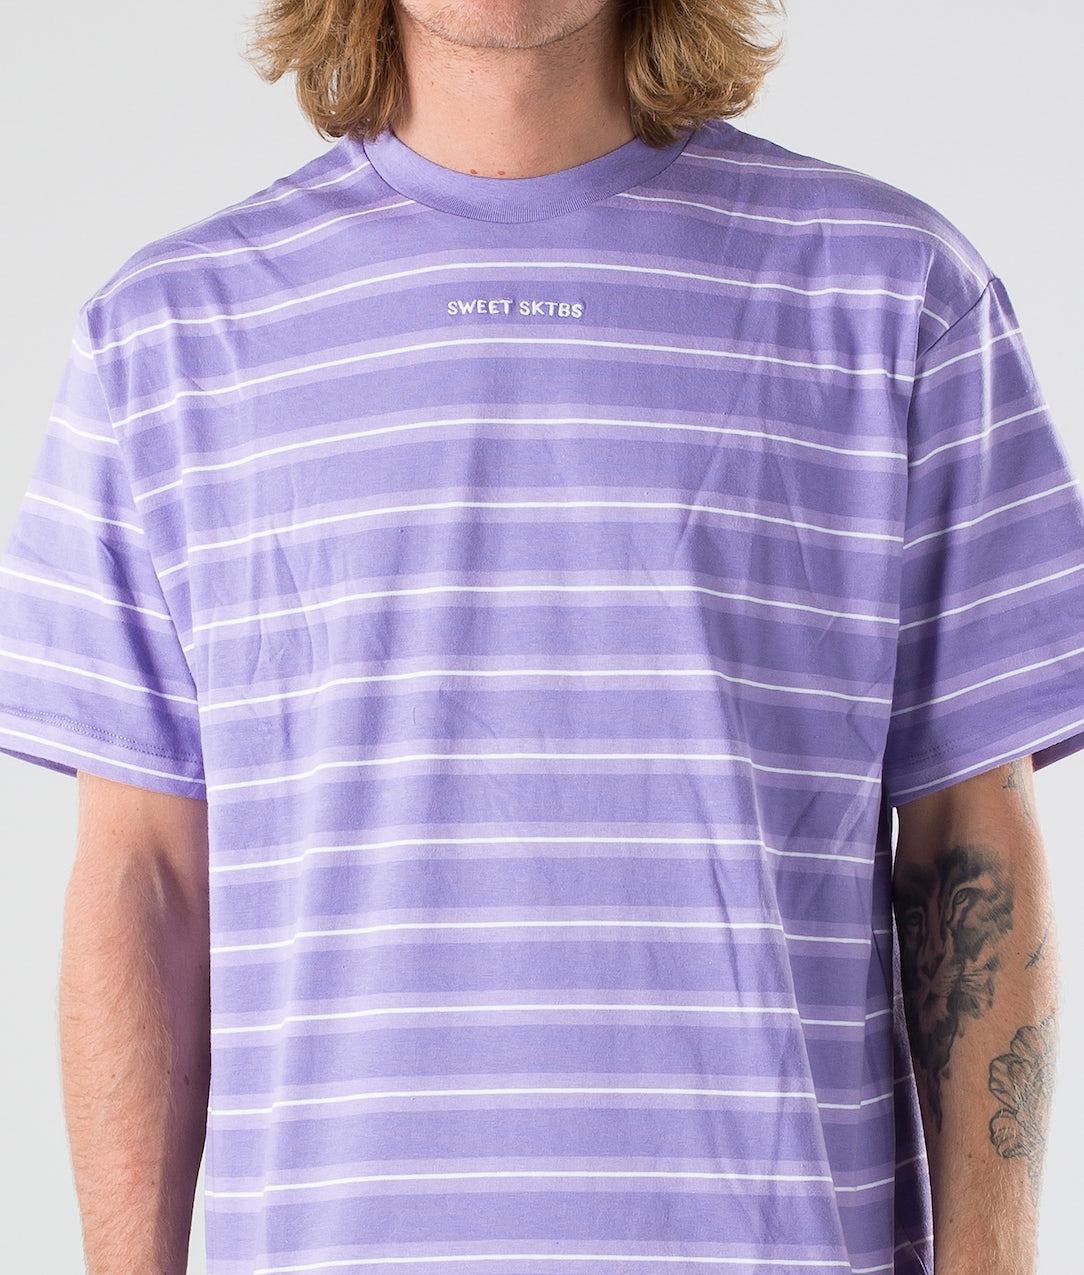 Sweet SKTBS 90S Loose T-shirt Light Purple/Purple Blue/White